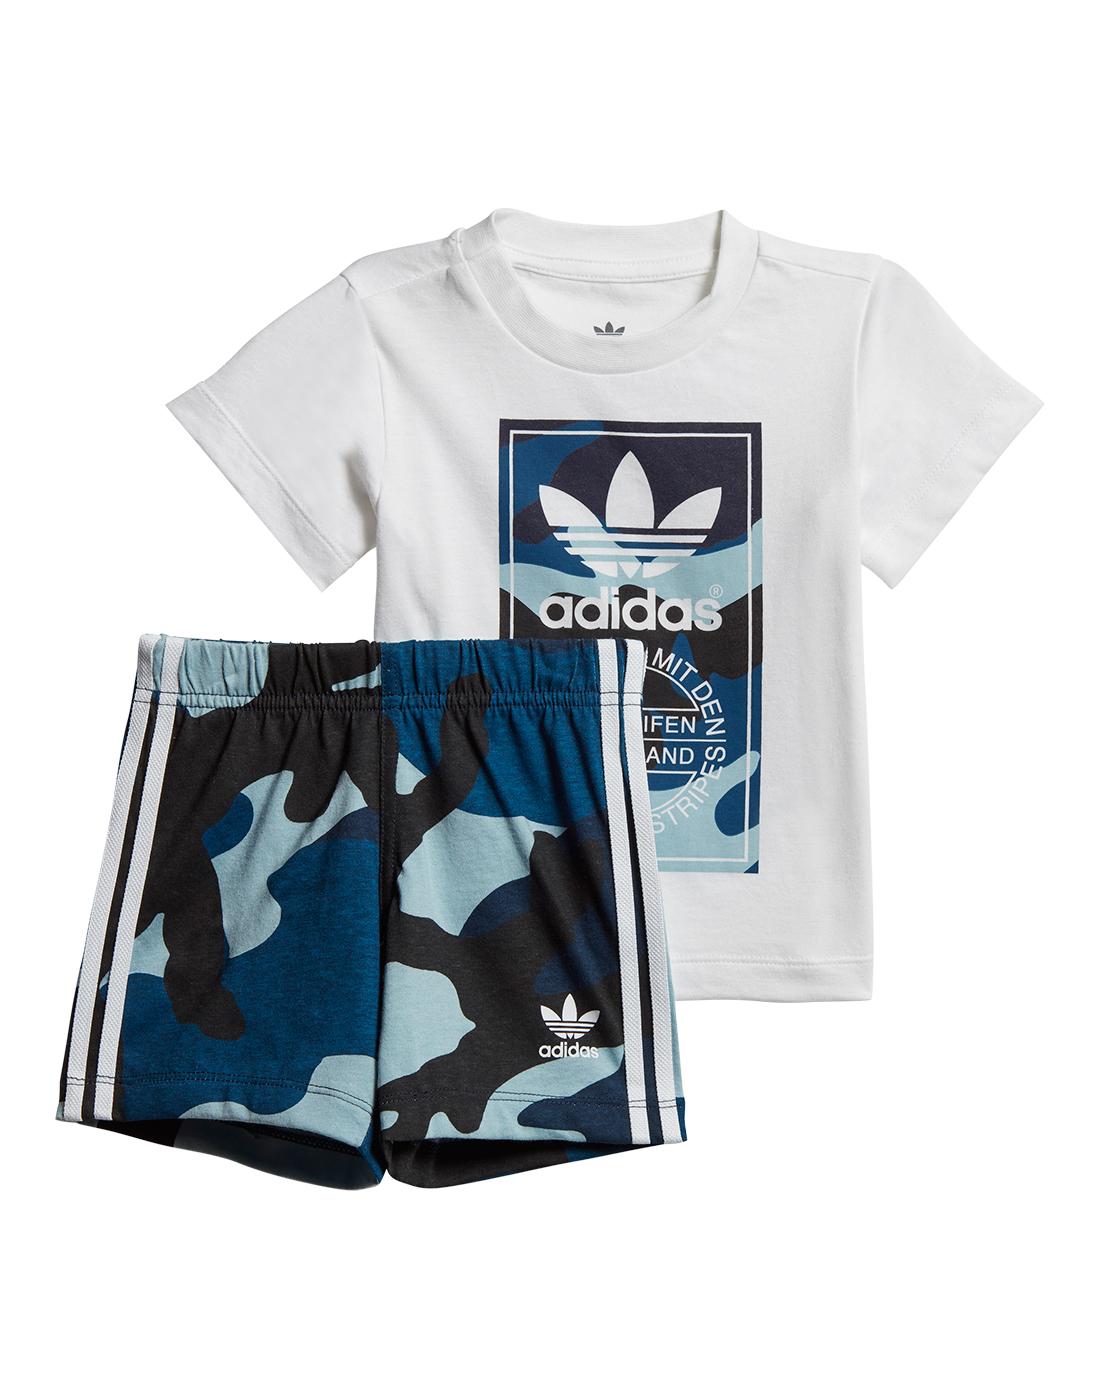 4cbb54c0 Infants Blue Camo adidas Originals T-Shirt & Shorts | Life Style Sports